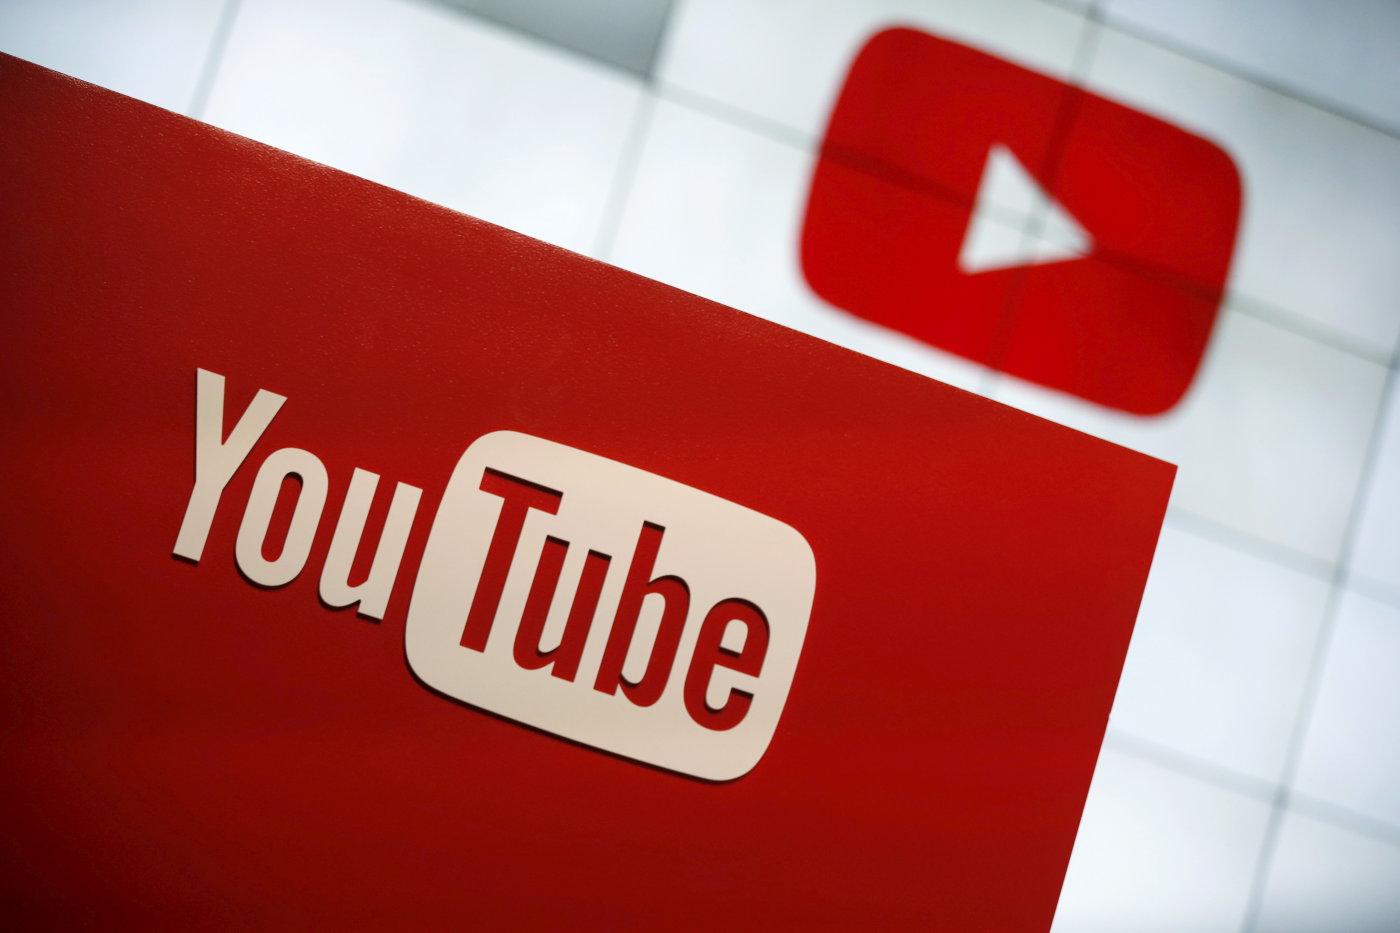 Mami, pot să am canalul meu de youtube?